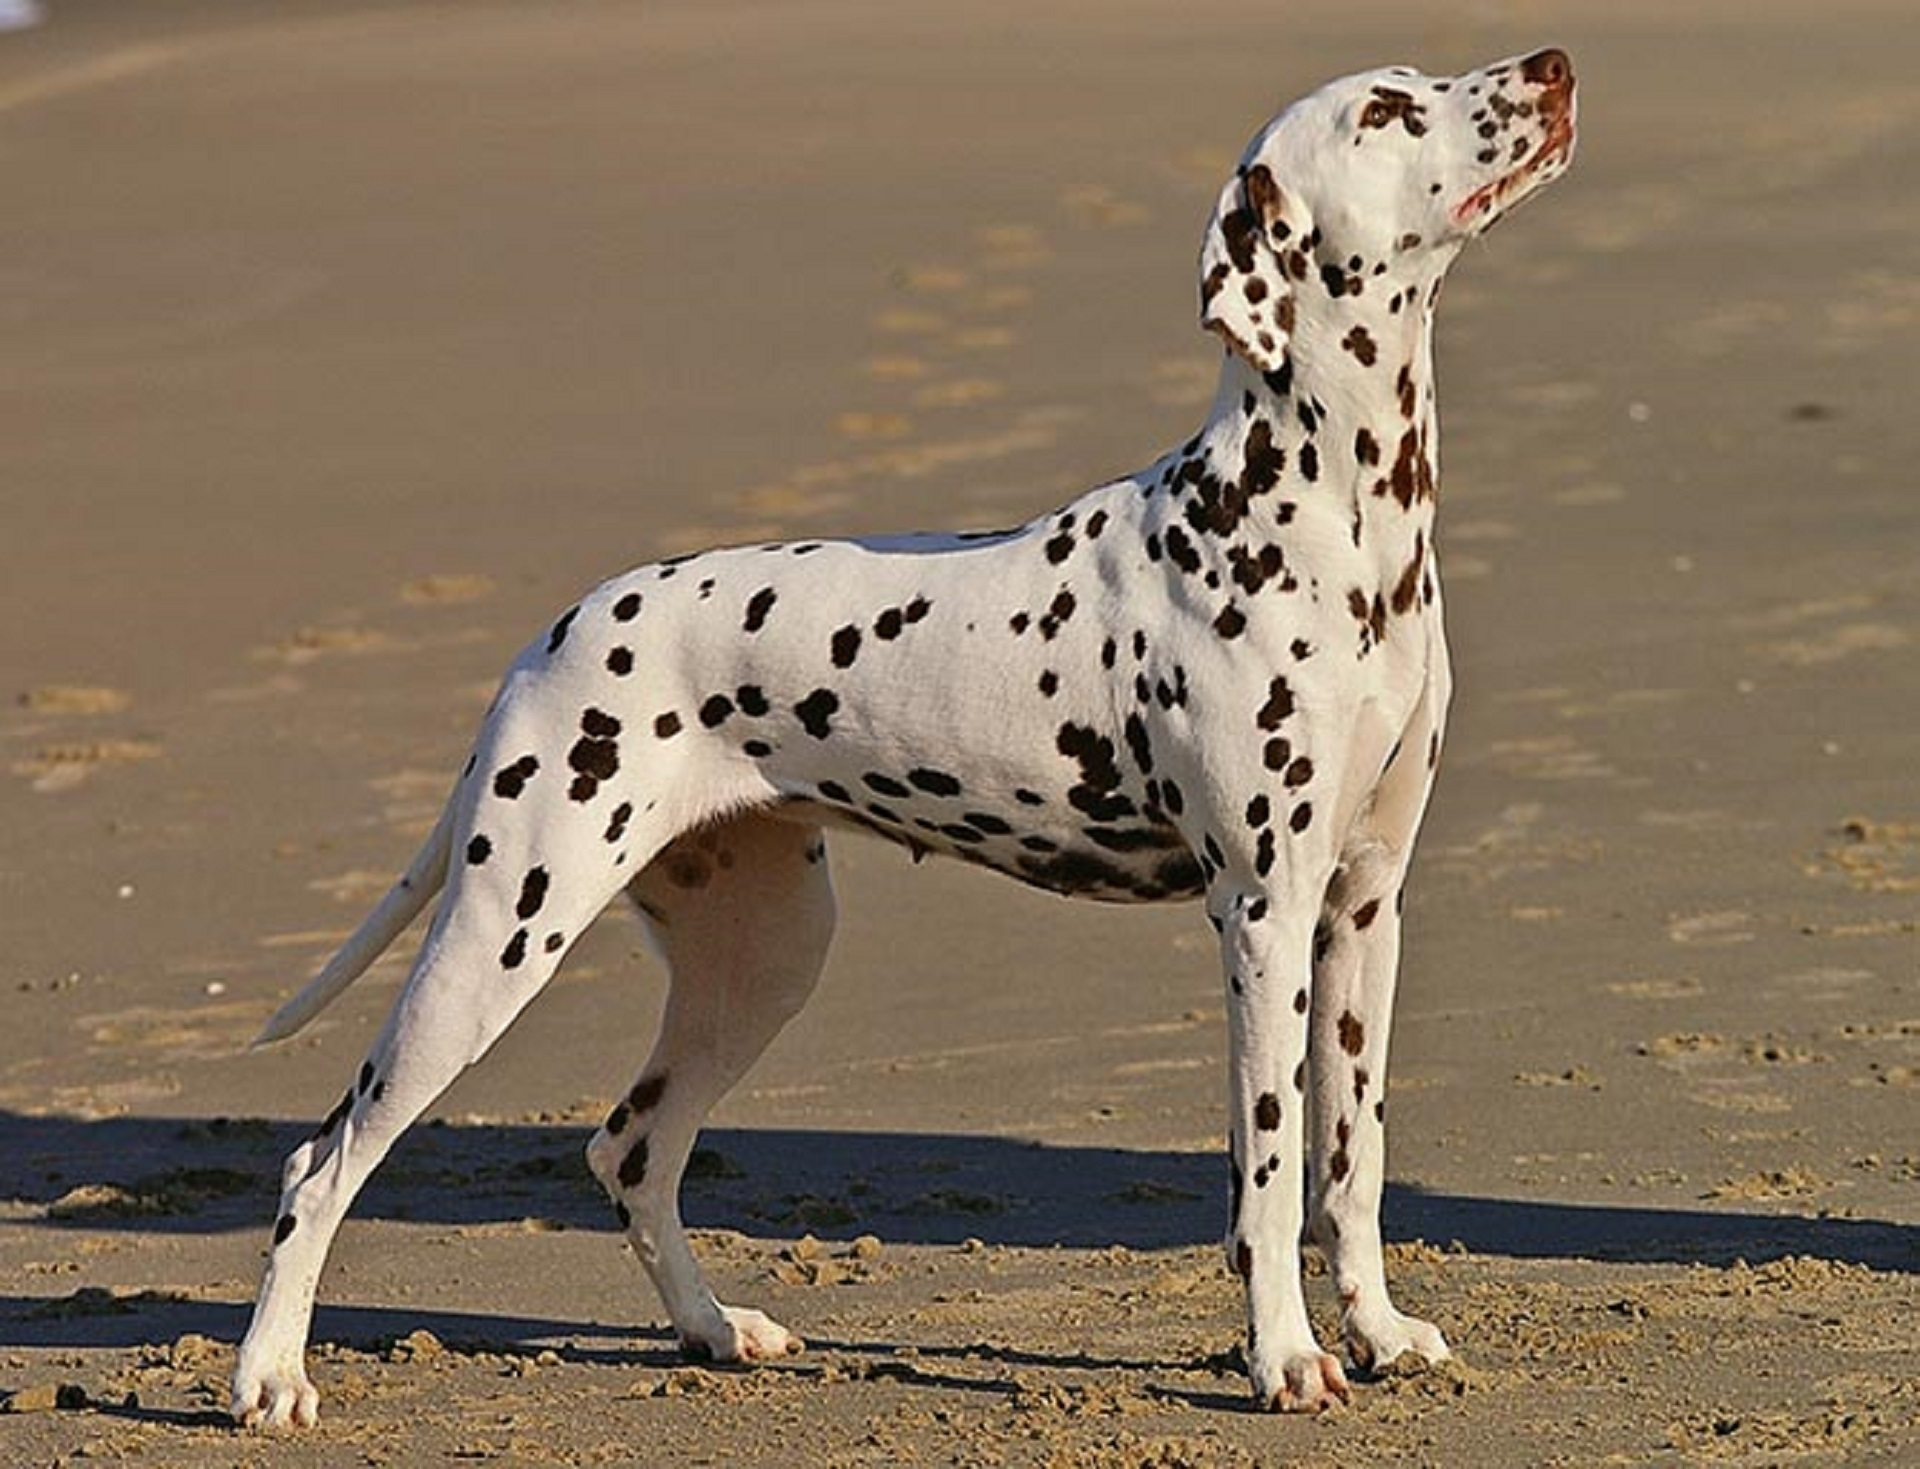 Dalmatian, Animal, Dalmation, Dog, Friend, HQ Photo